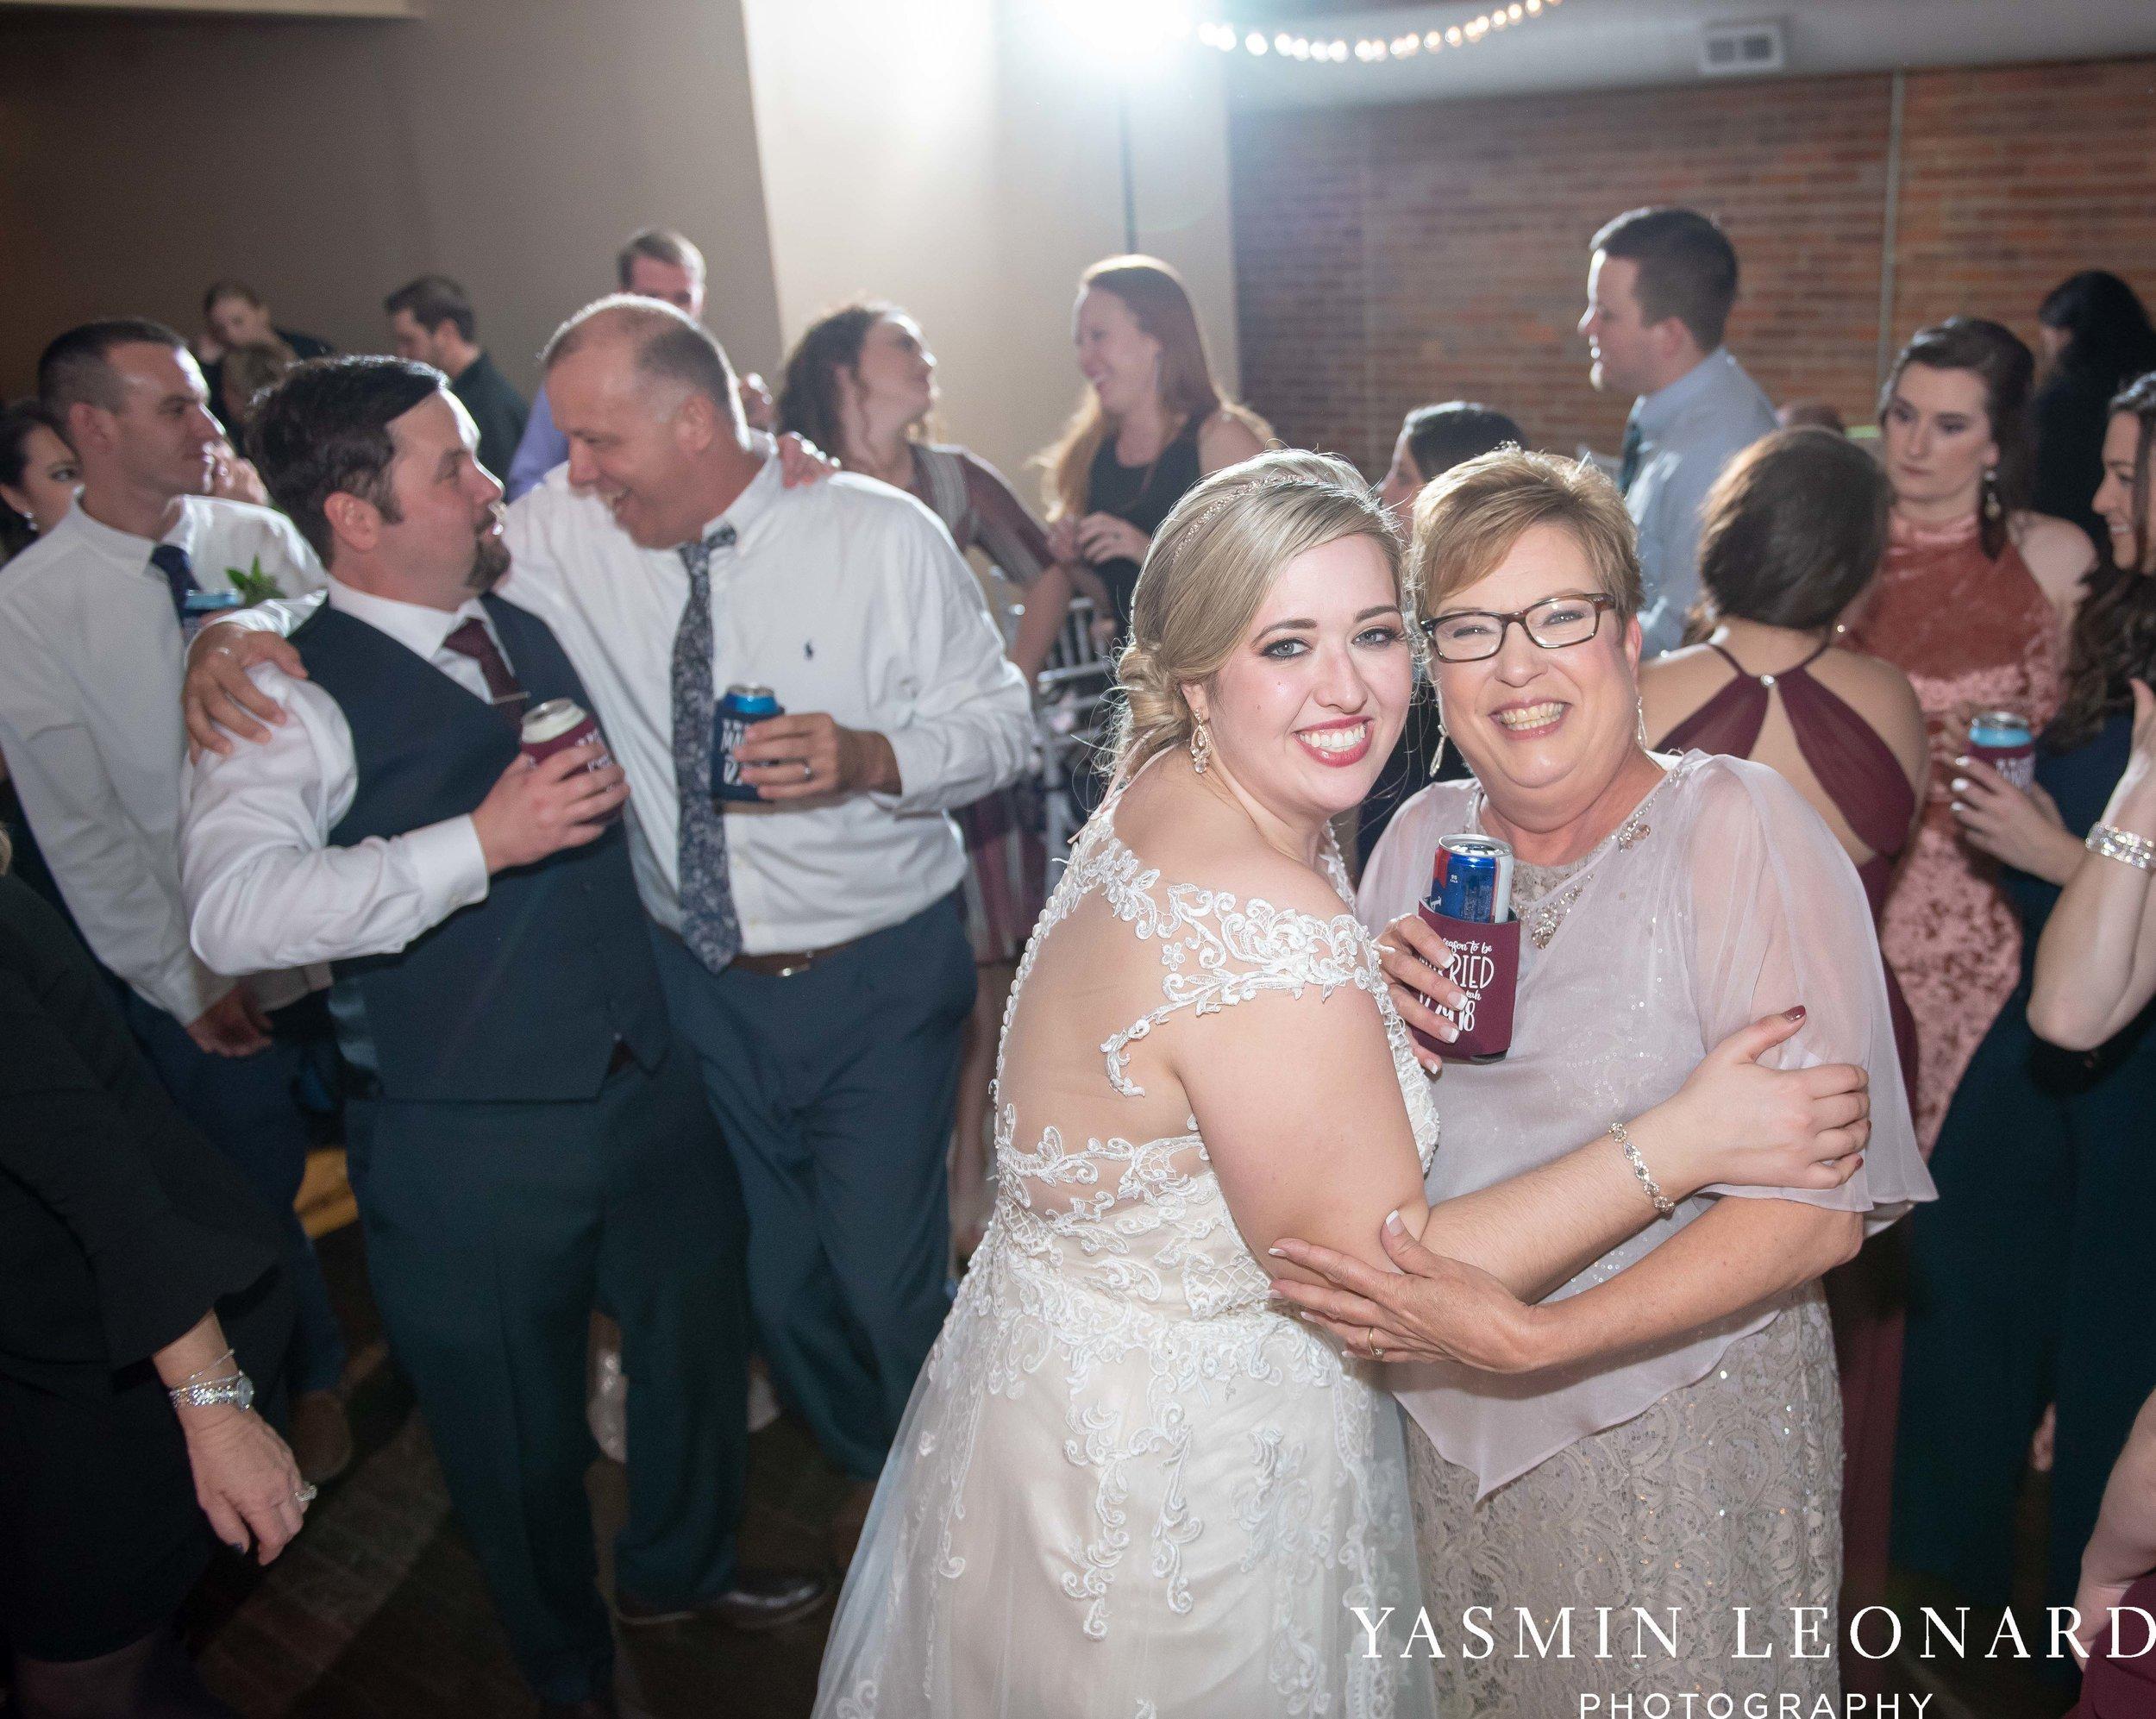 Rebekah and Matt - 105 Worth Event Centre - Yasmin Leonard Photography - Asheboro Wedding - NC Wedding - High Point Weddings - Triad Weddings - Winter Wedding-84.jpg